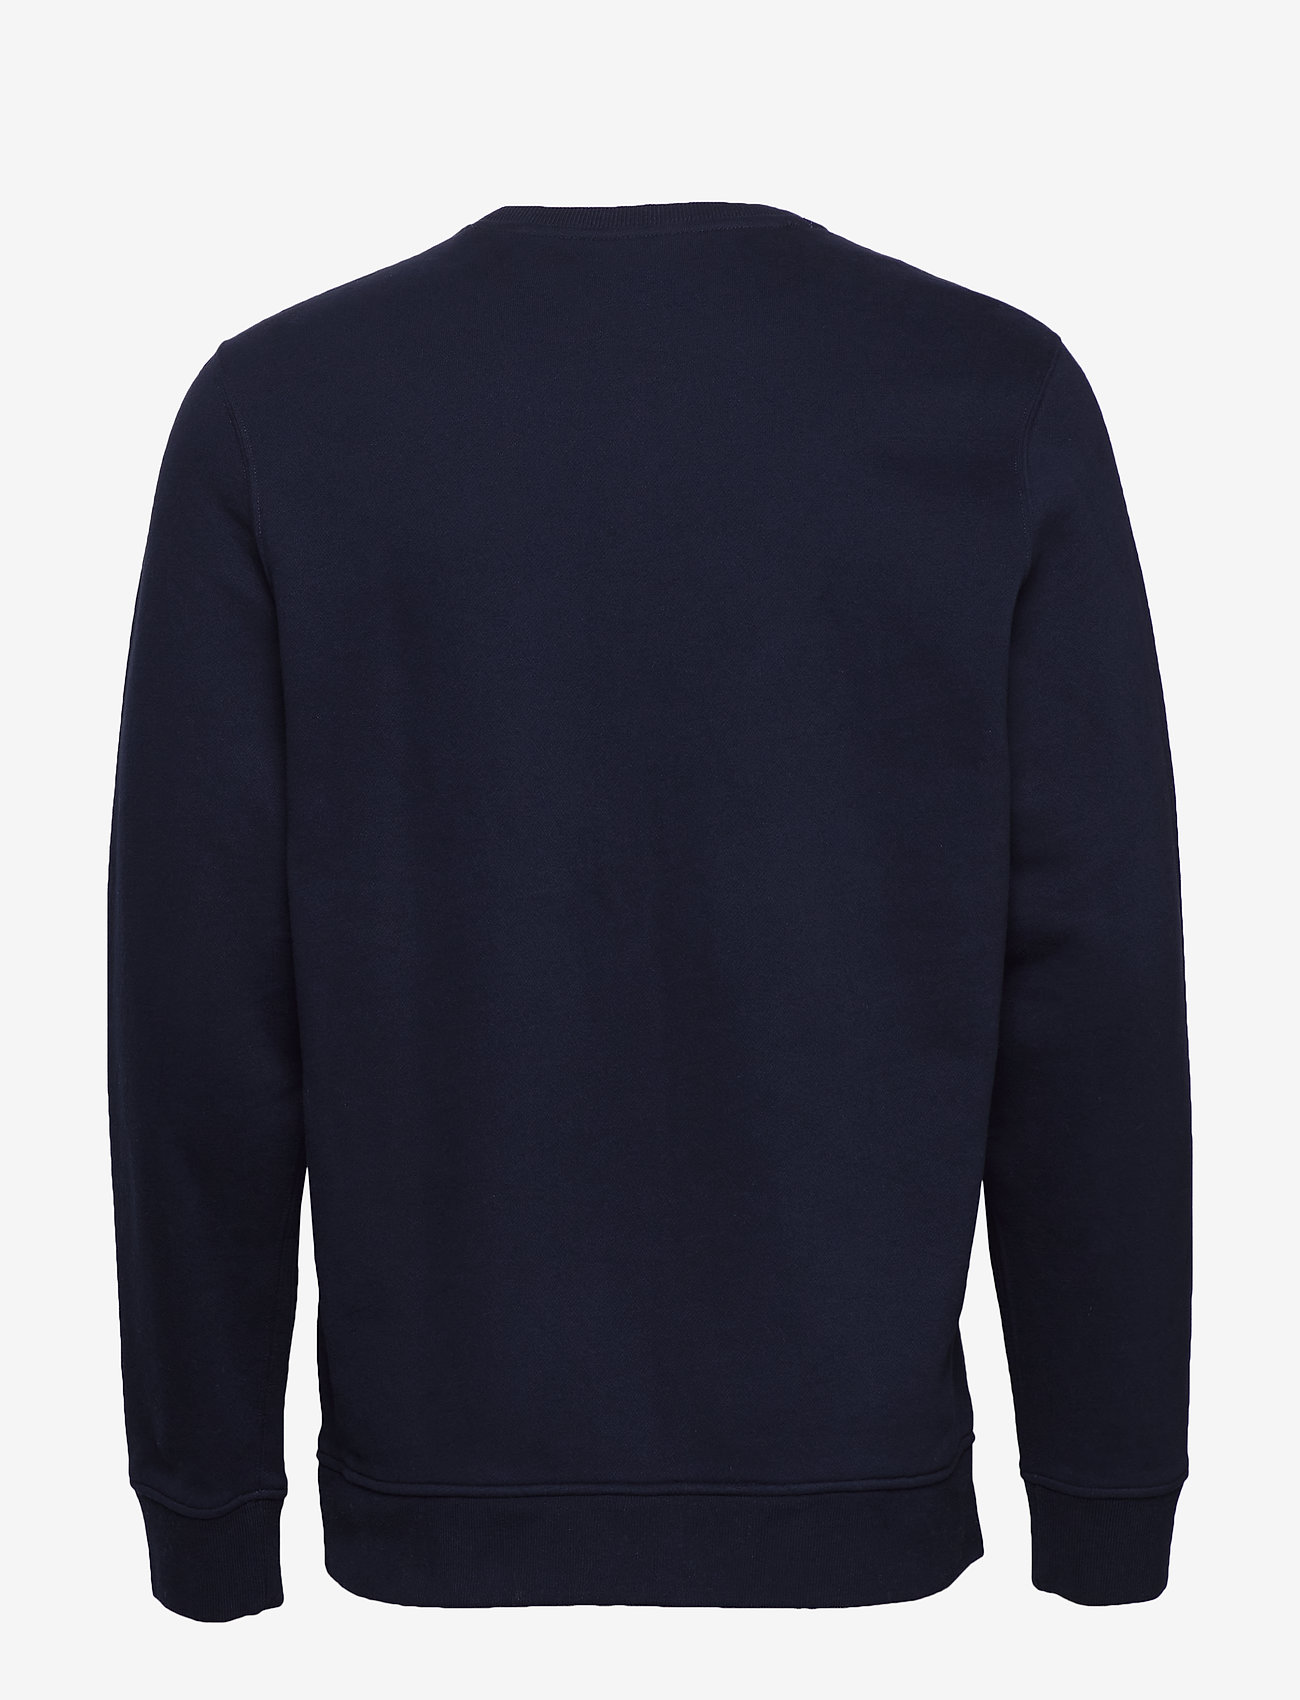 Abercrombie & Fitch Icon Crew - Sweatshirts Navy Dd